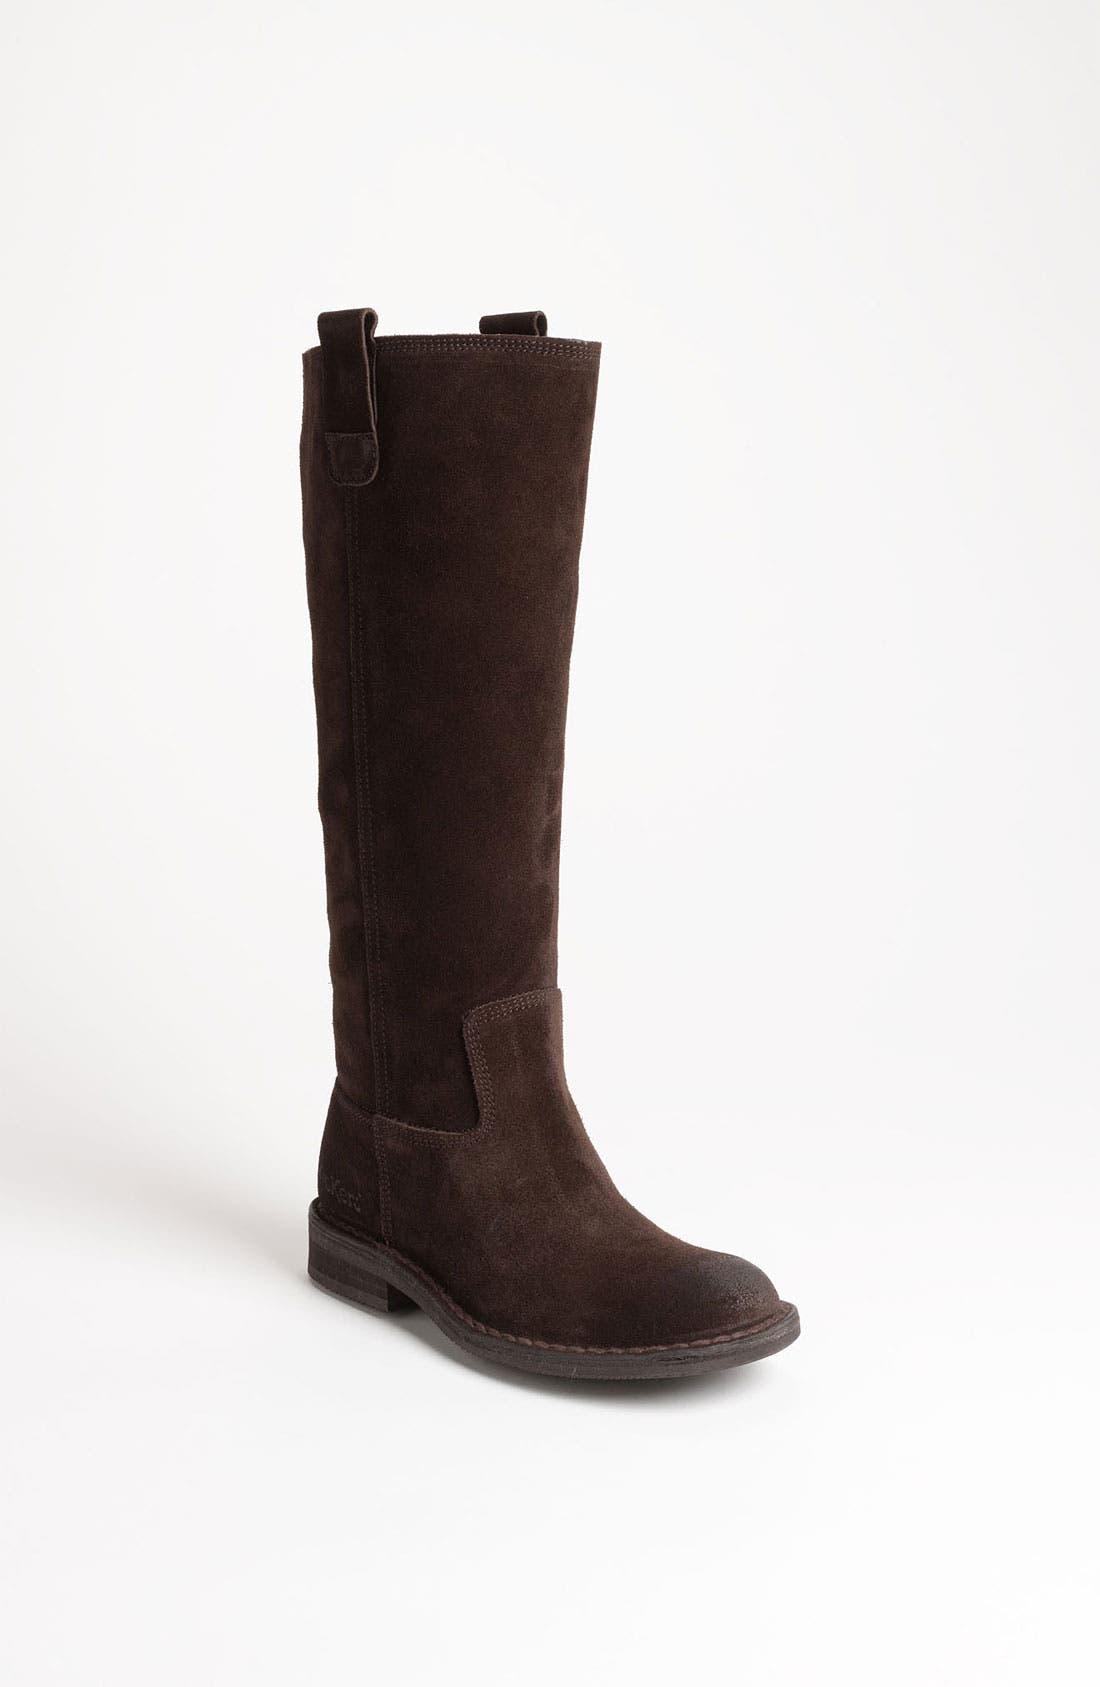 KICKERS 'Histme' Boot, Main, color, 201